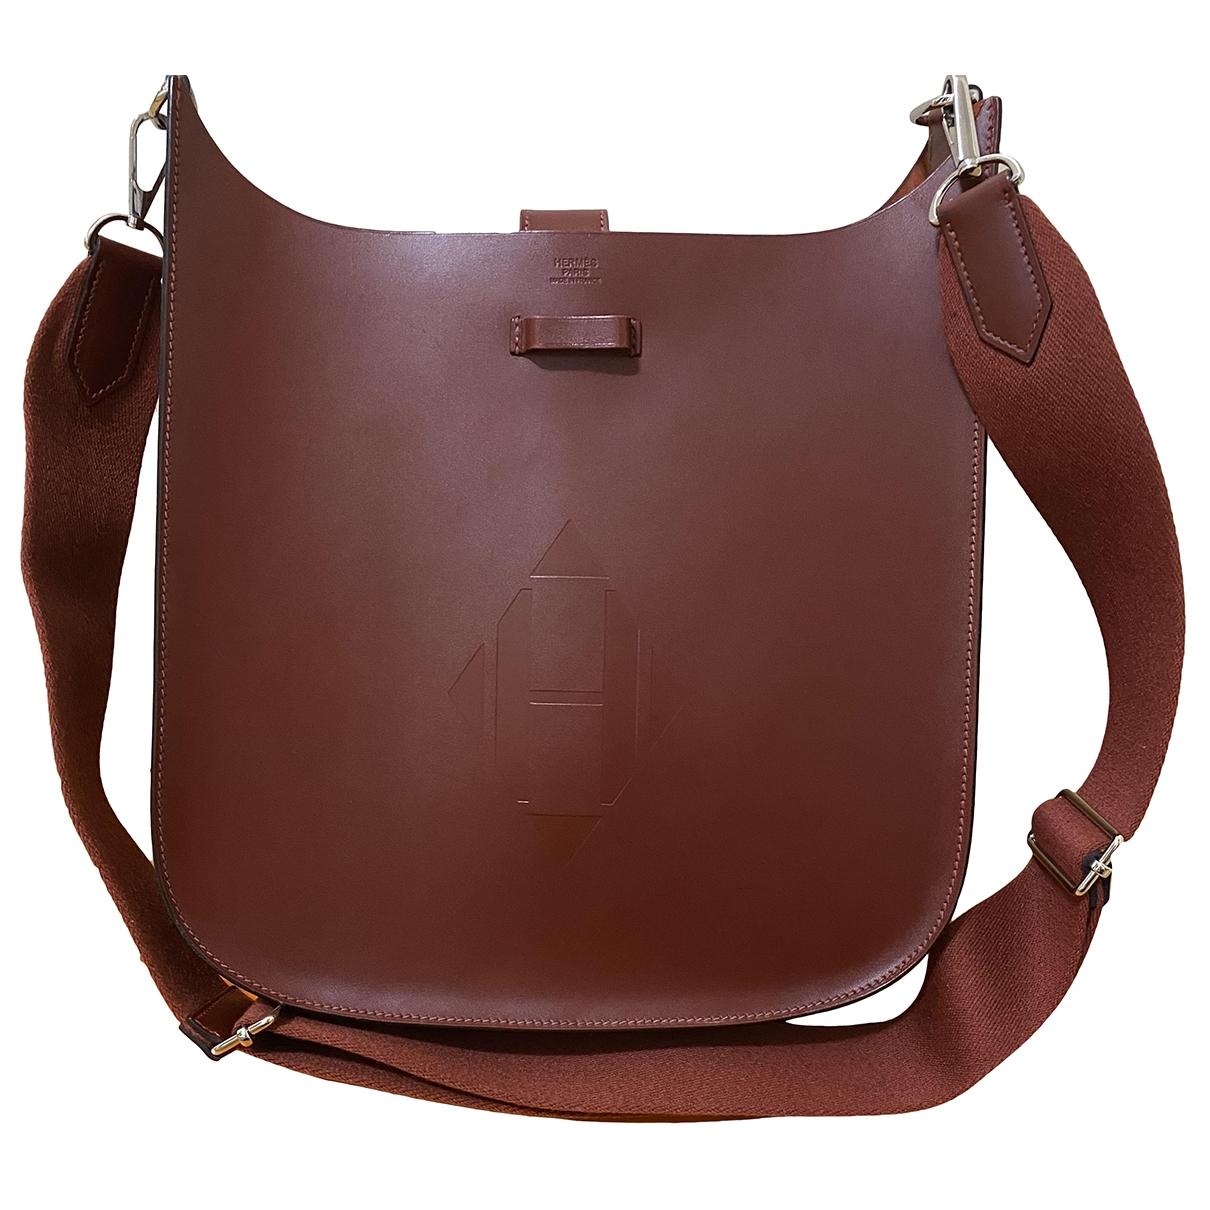 Hermès Evelyne Sellier Burgundy Leather handbag for Women \N